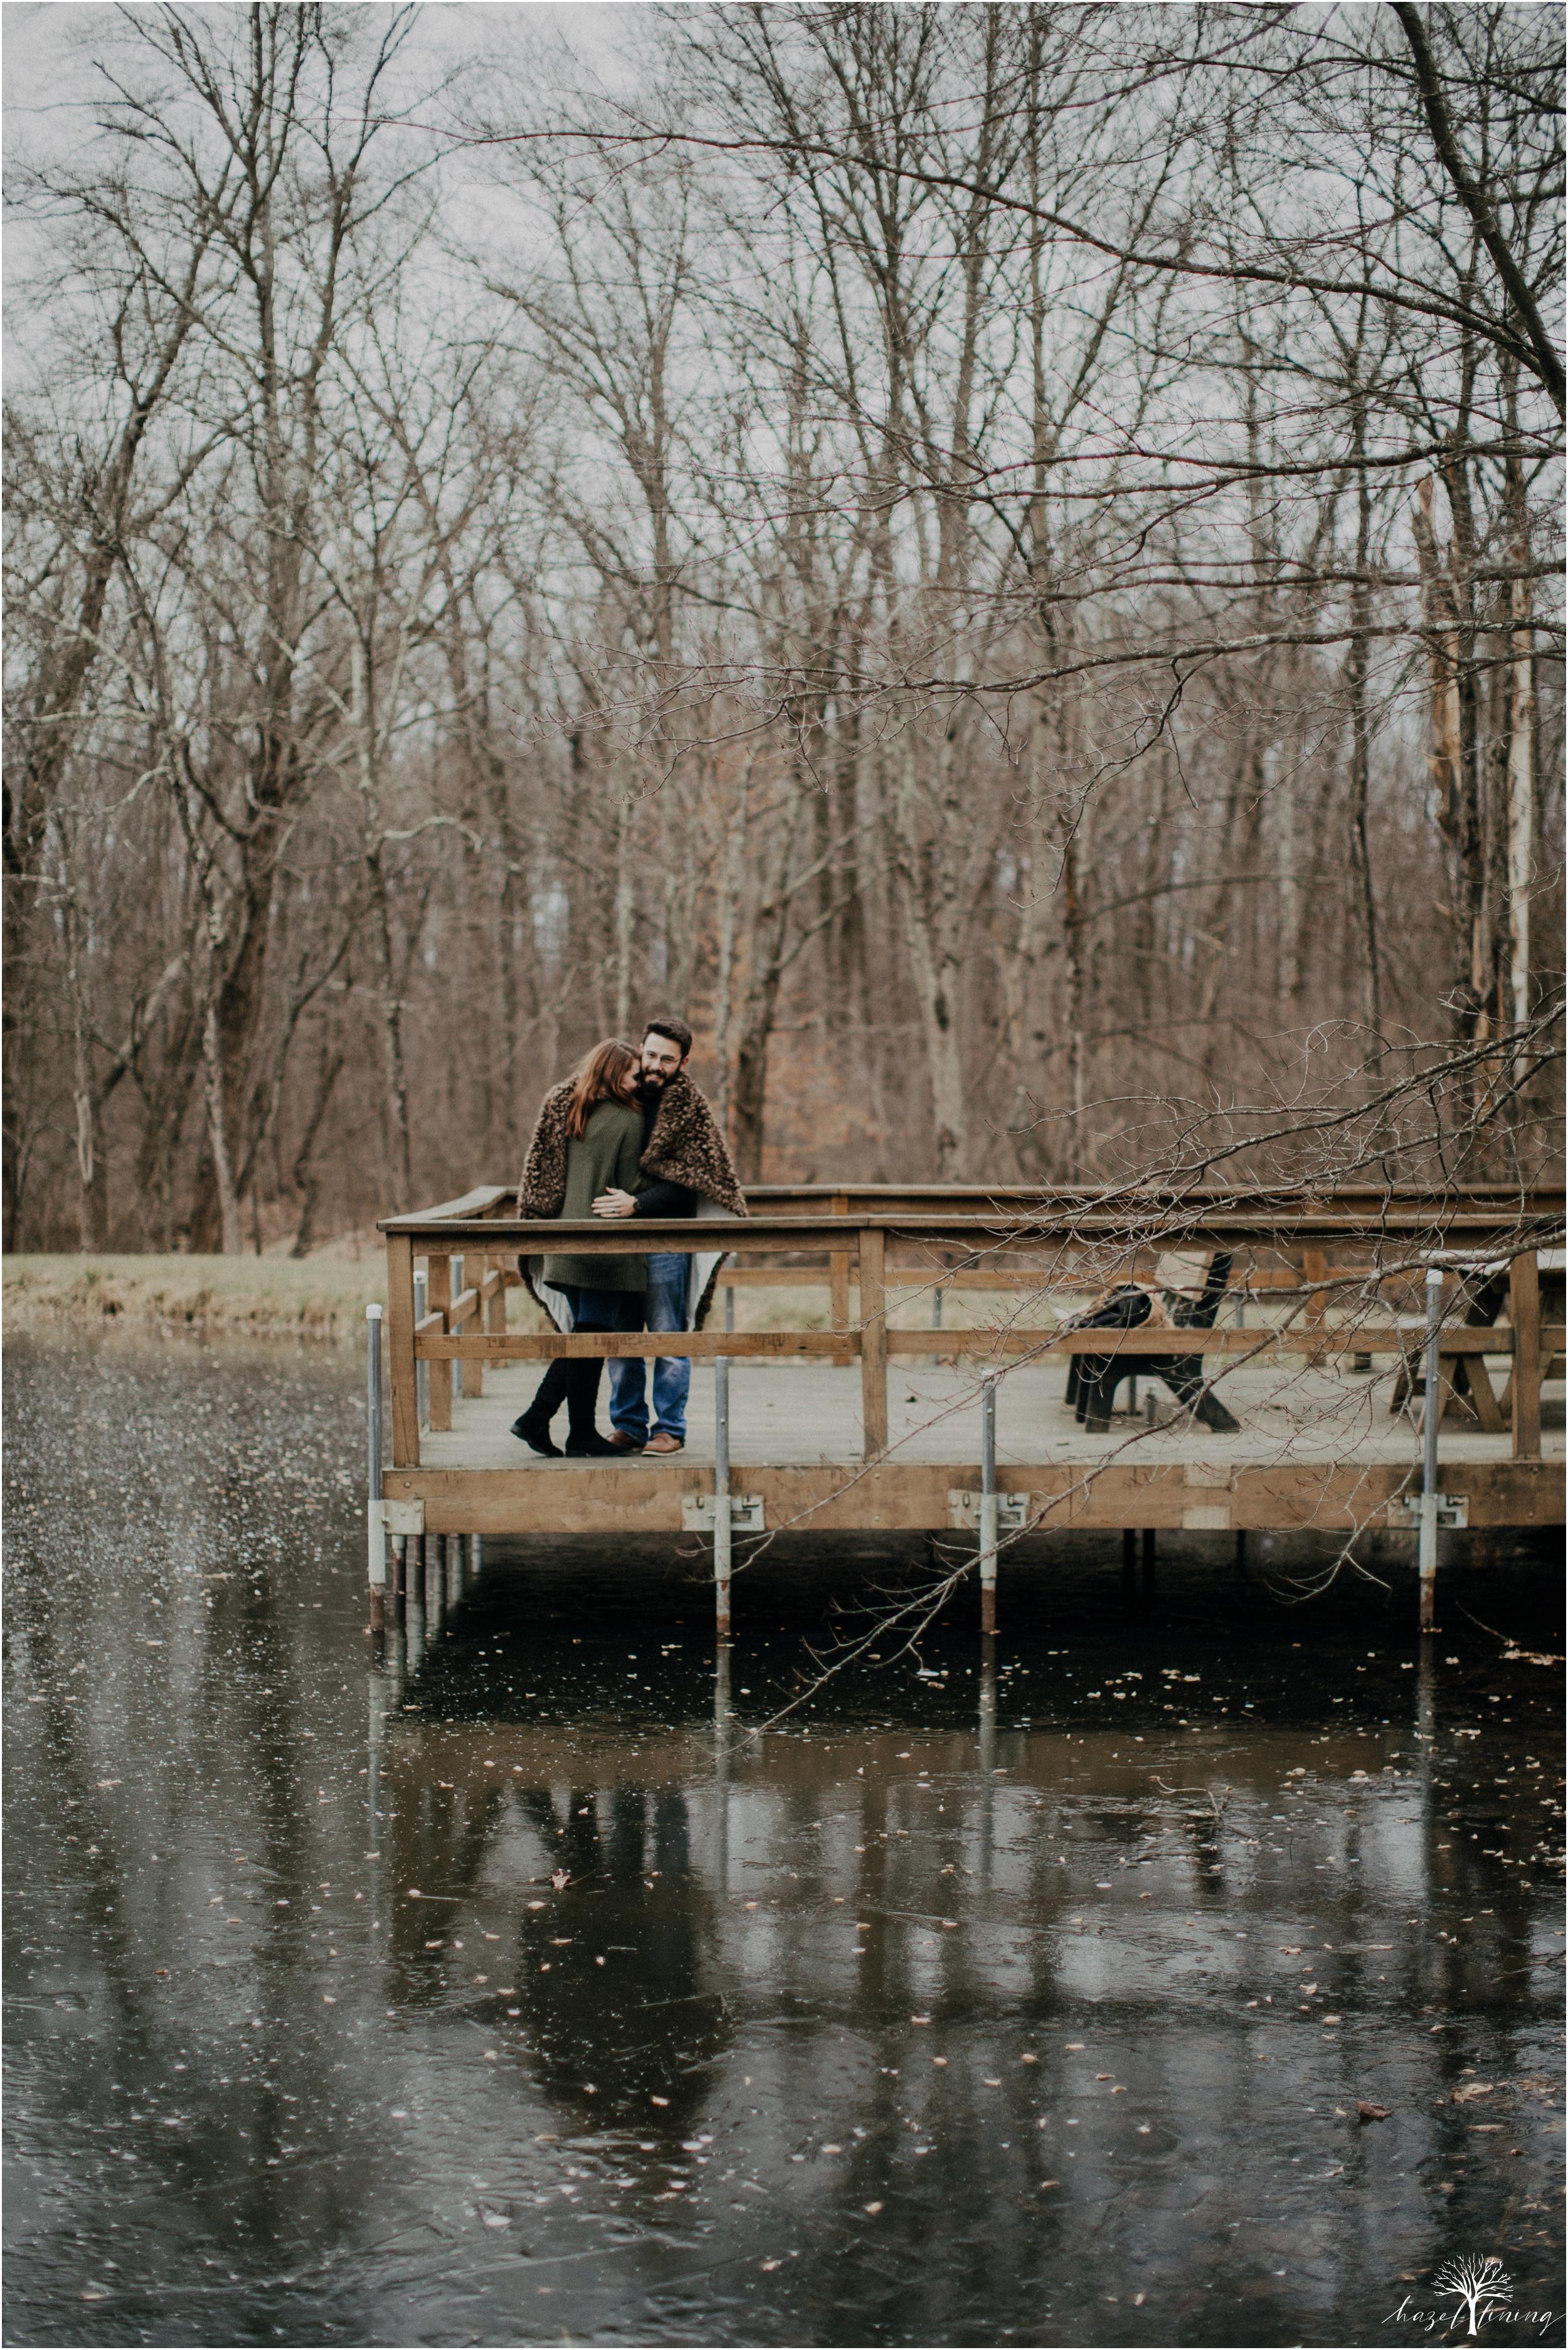 evan-maggie-lesh-one-year-anniversary-winter-shoot-camp-menolan-pennsylvania_0047.jpg